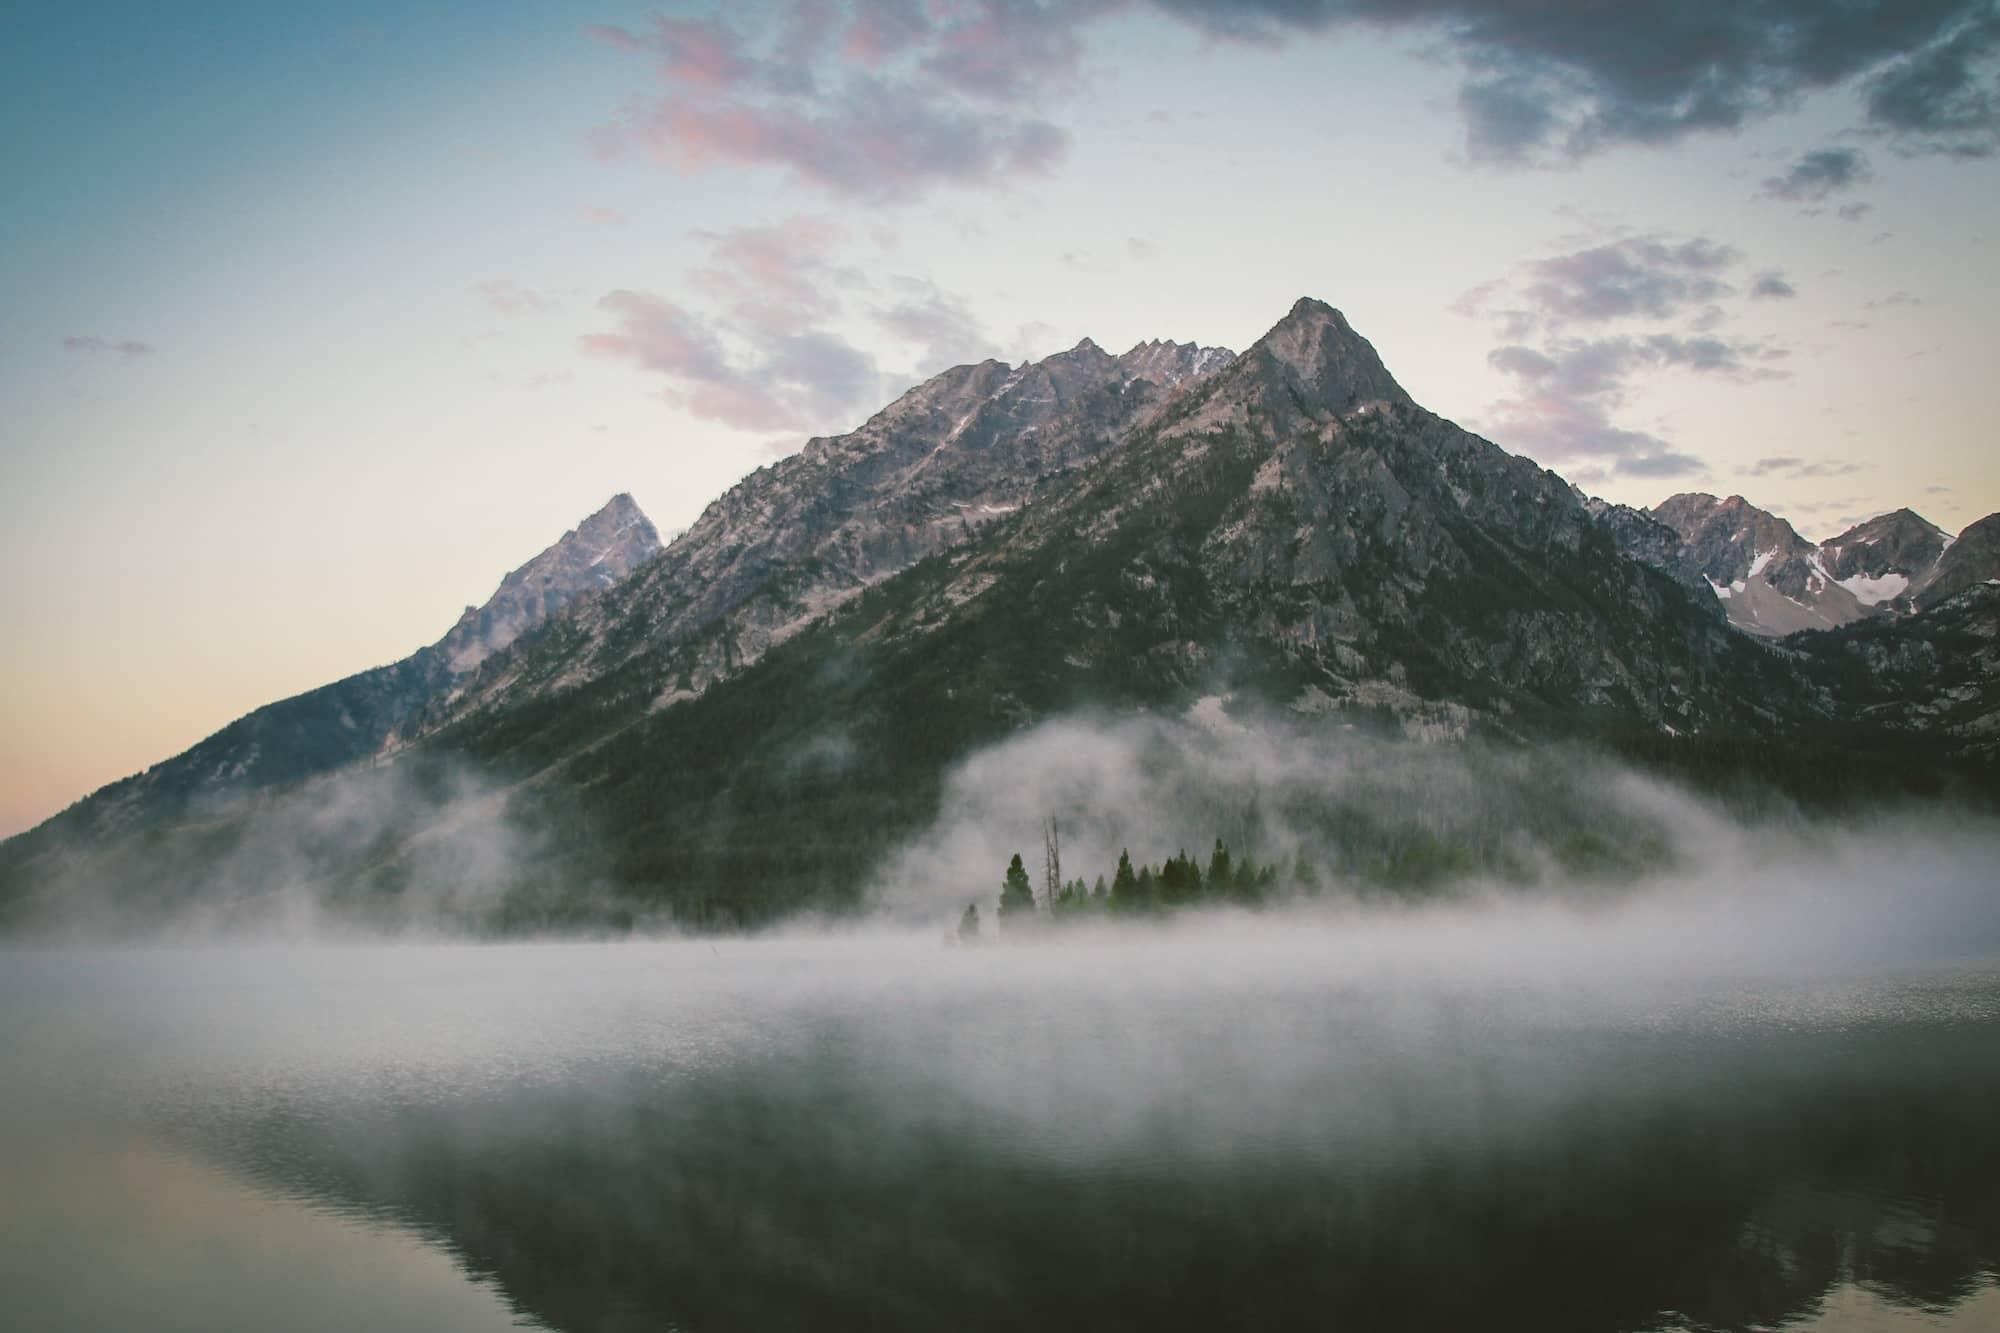 landscape-mountains-nature-mountain.jpeg